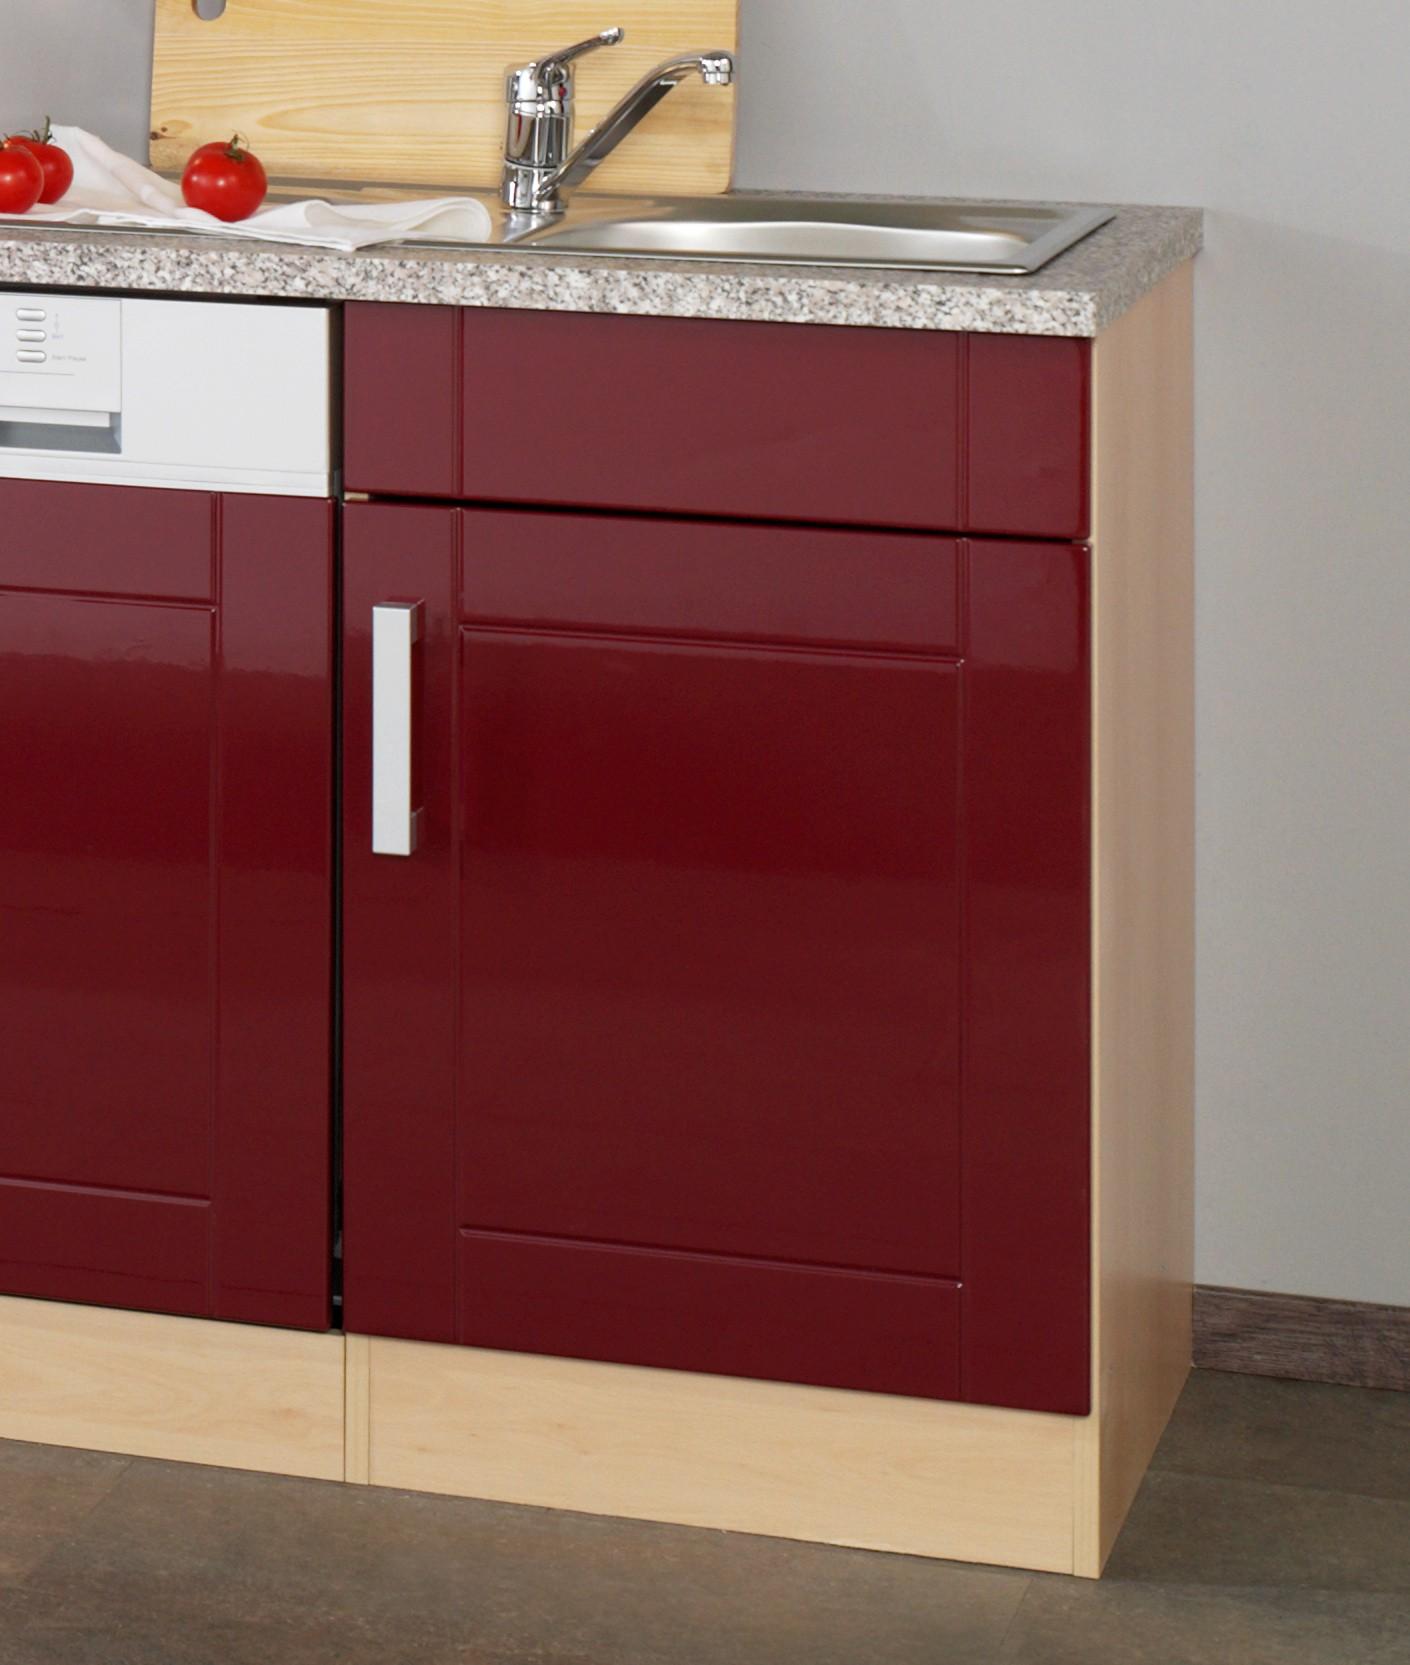 neu k chen leerblock k chenzeile varel k chenblock 220cm rot. Black Bedroom Furniture Sets. Home Design Ideas